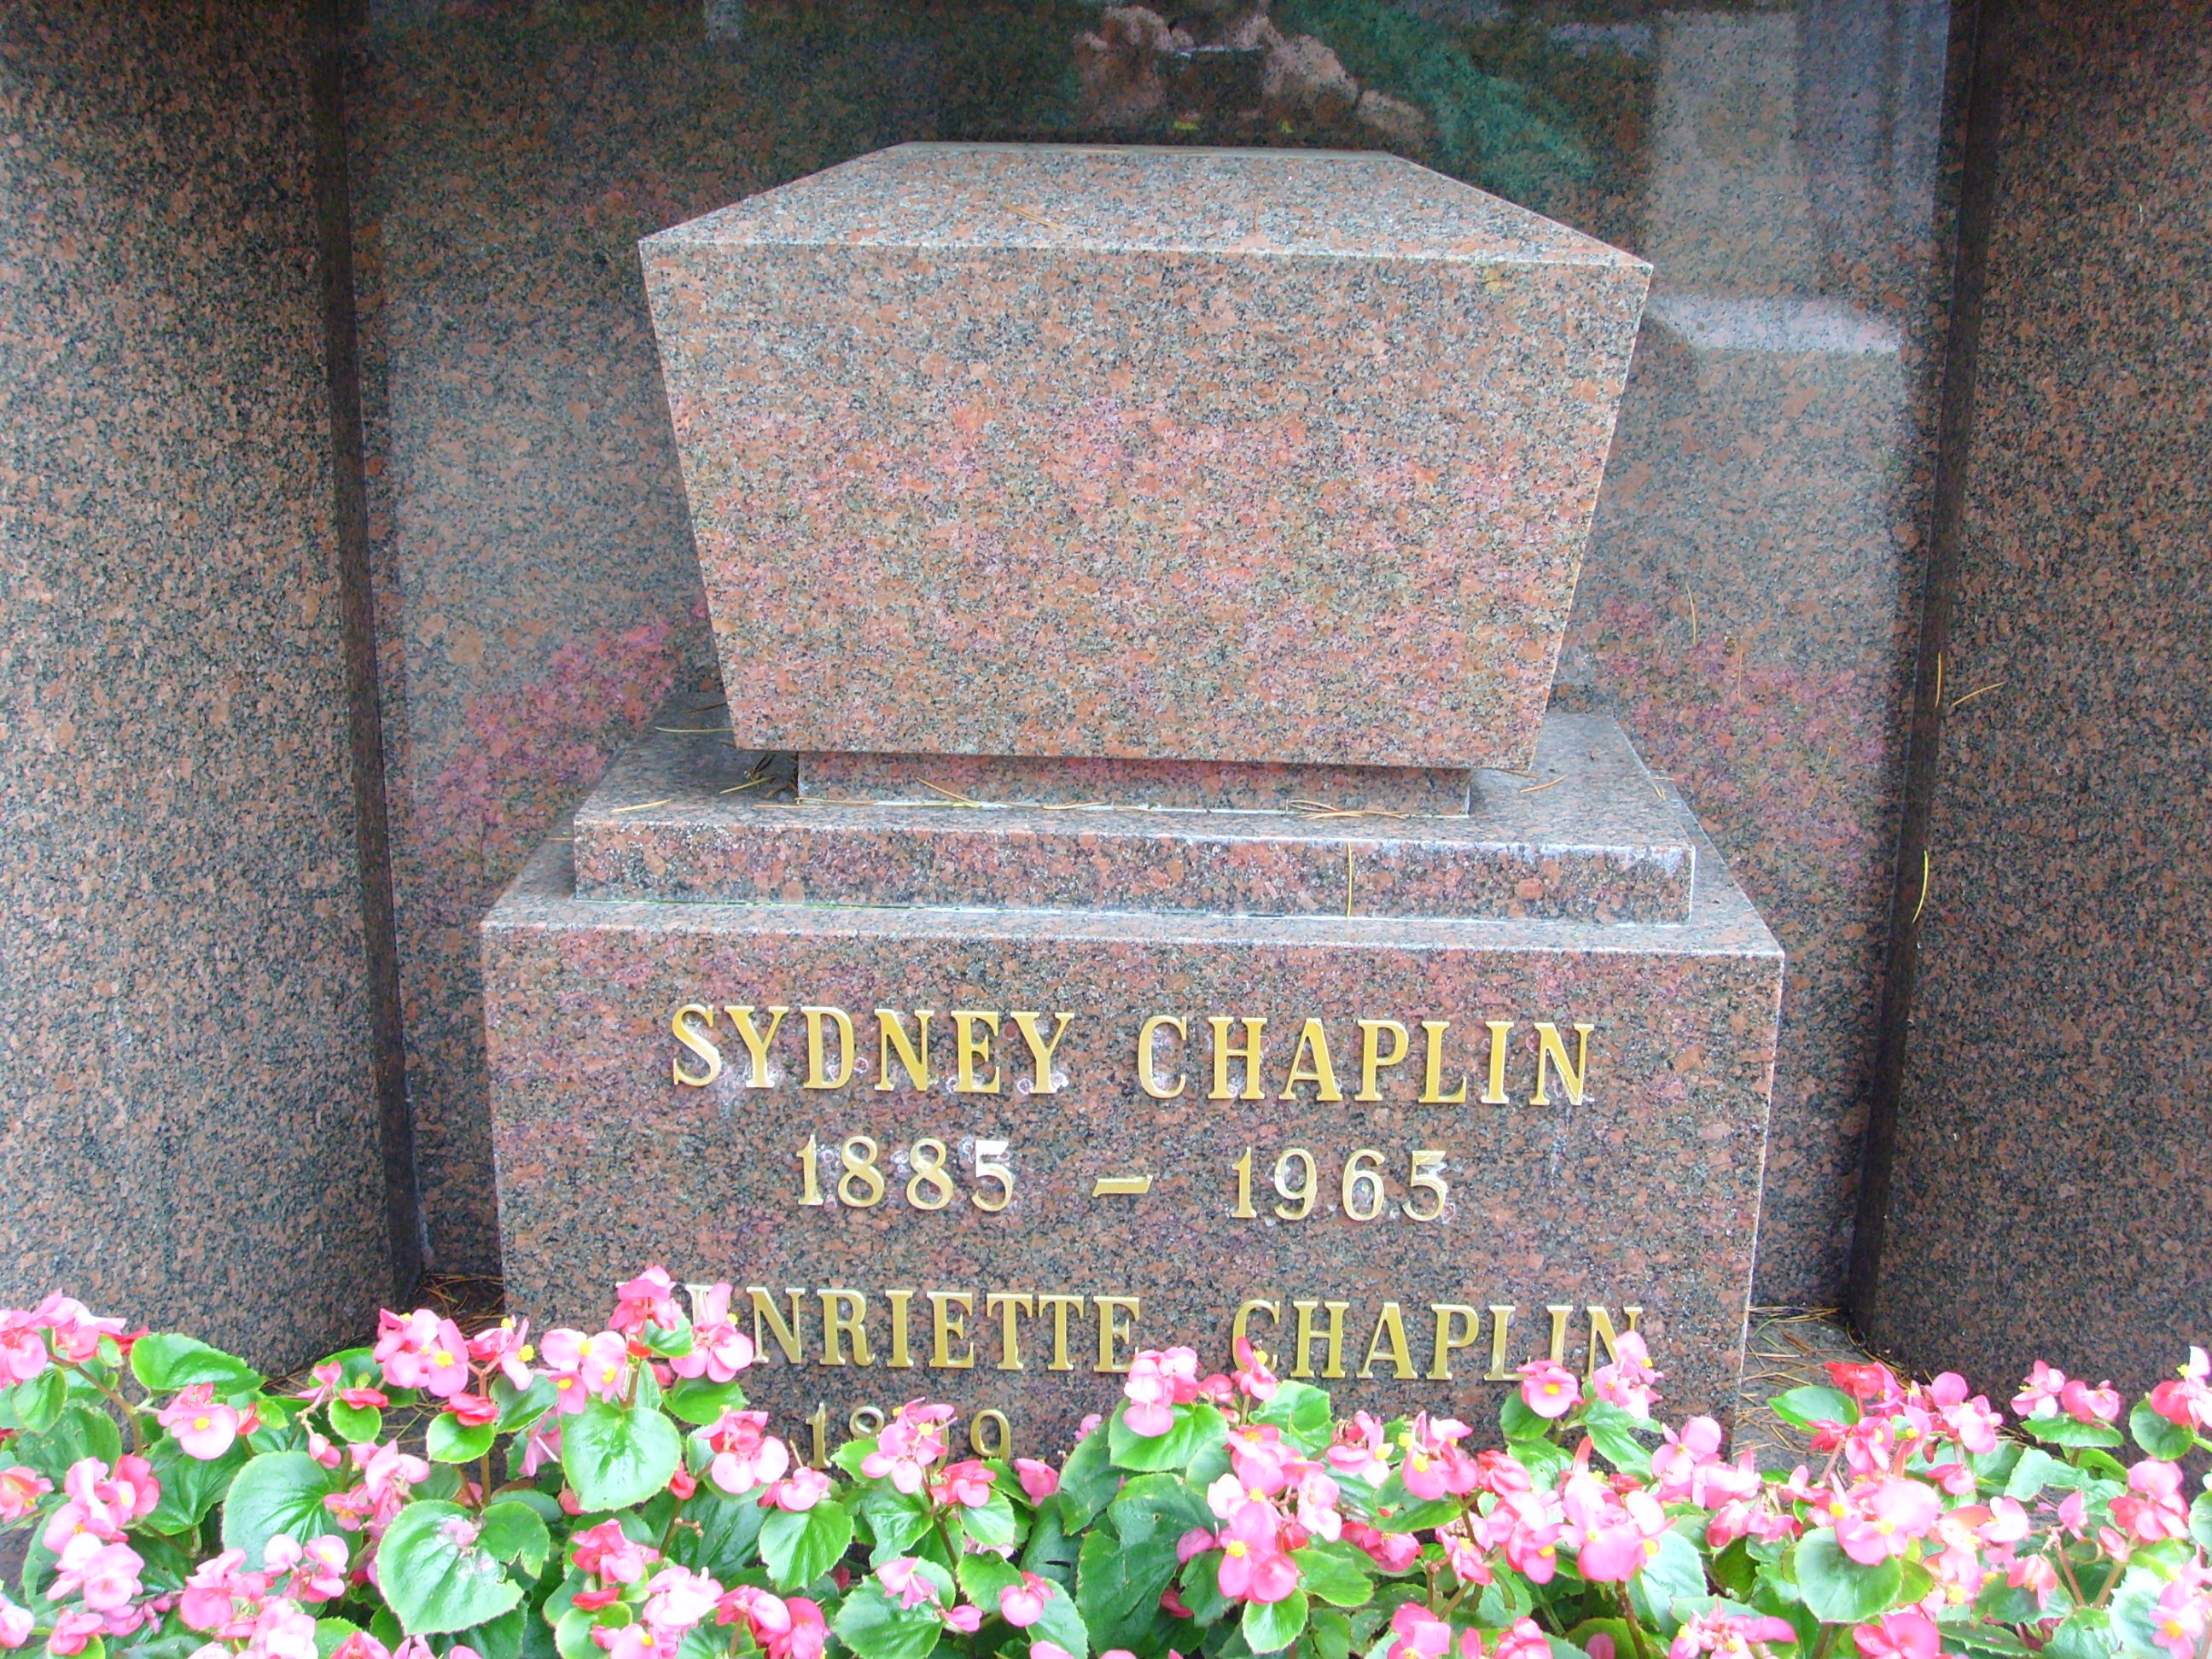 Charlie chaplin date of birth in Sydney